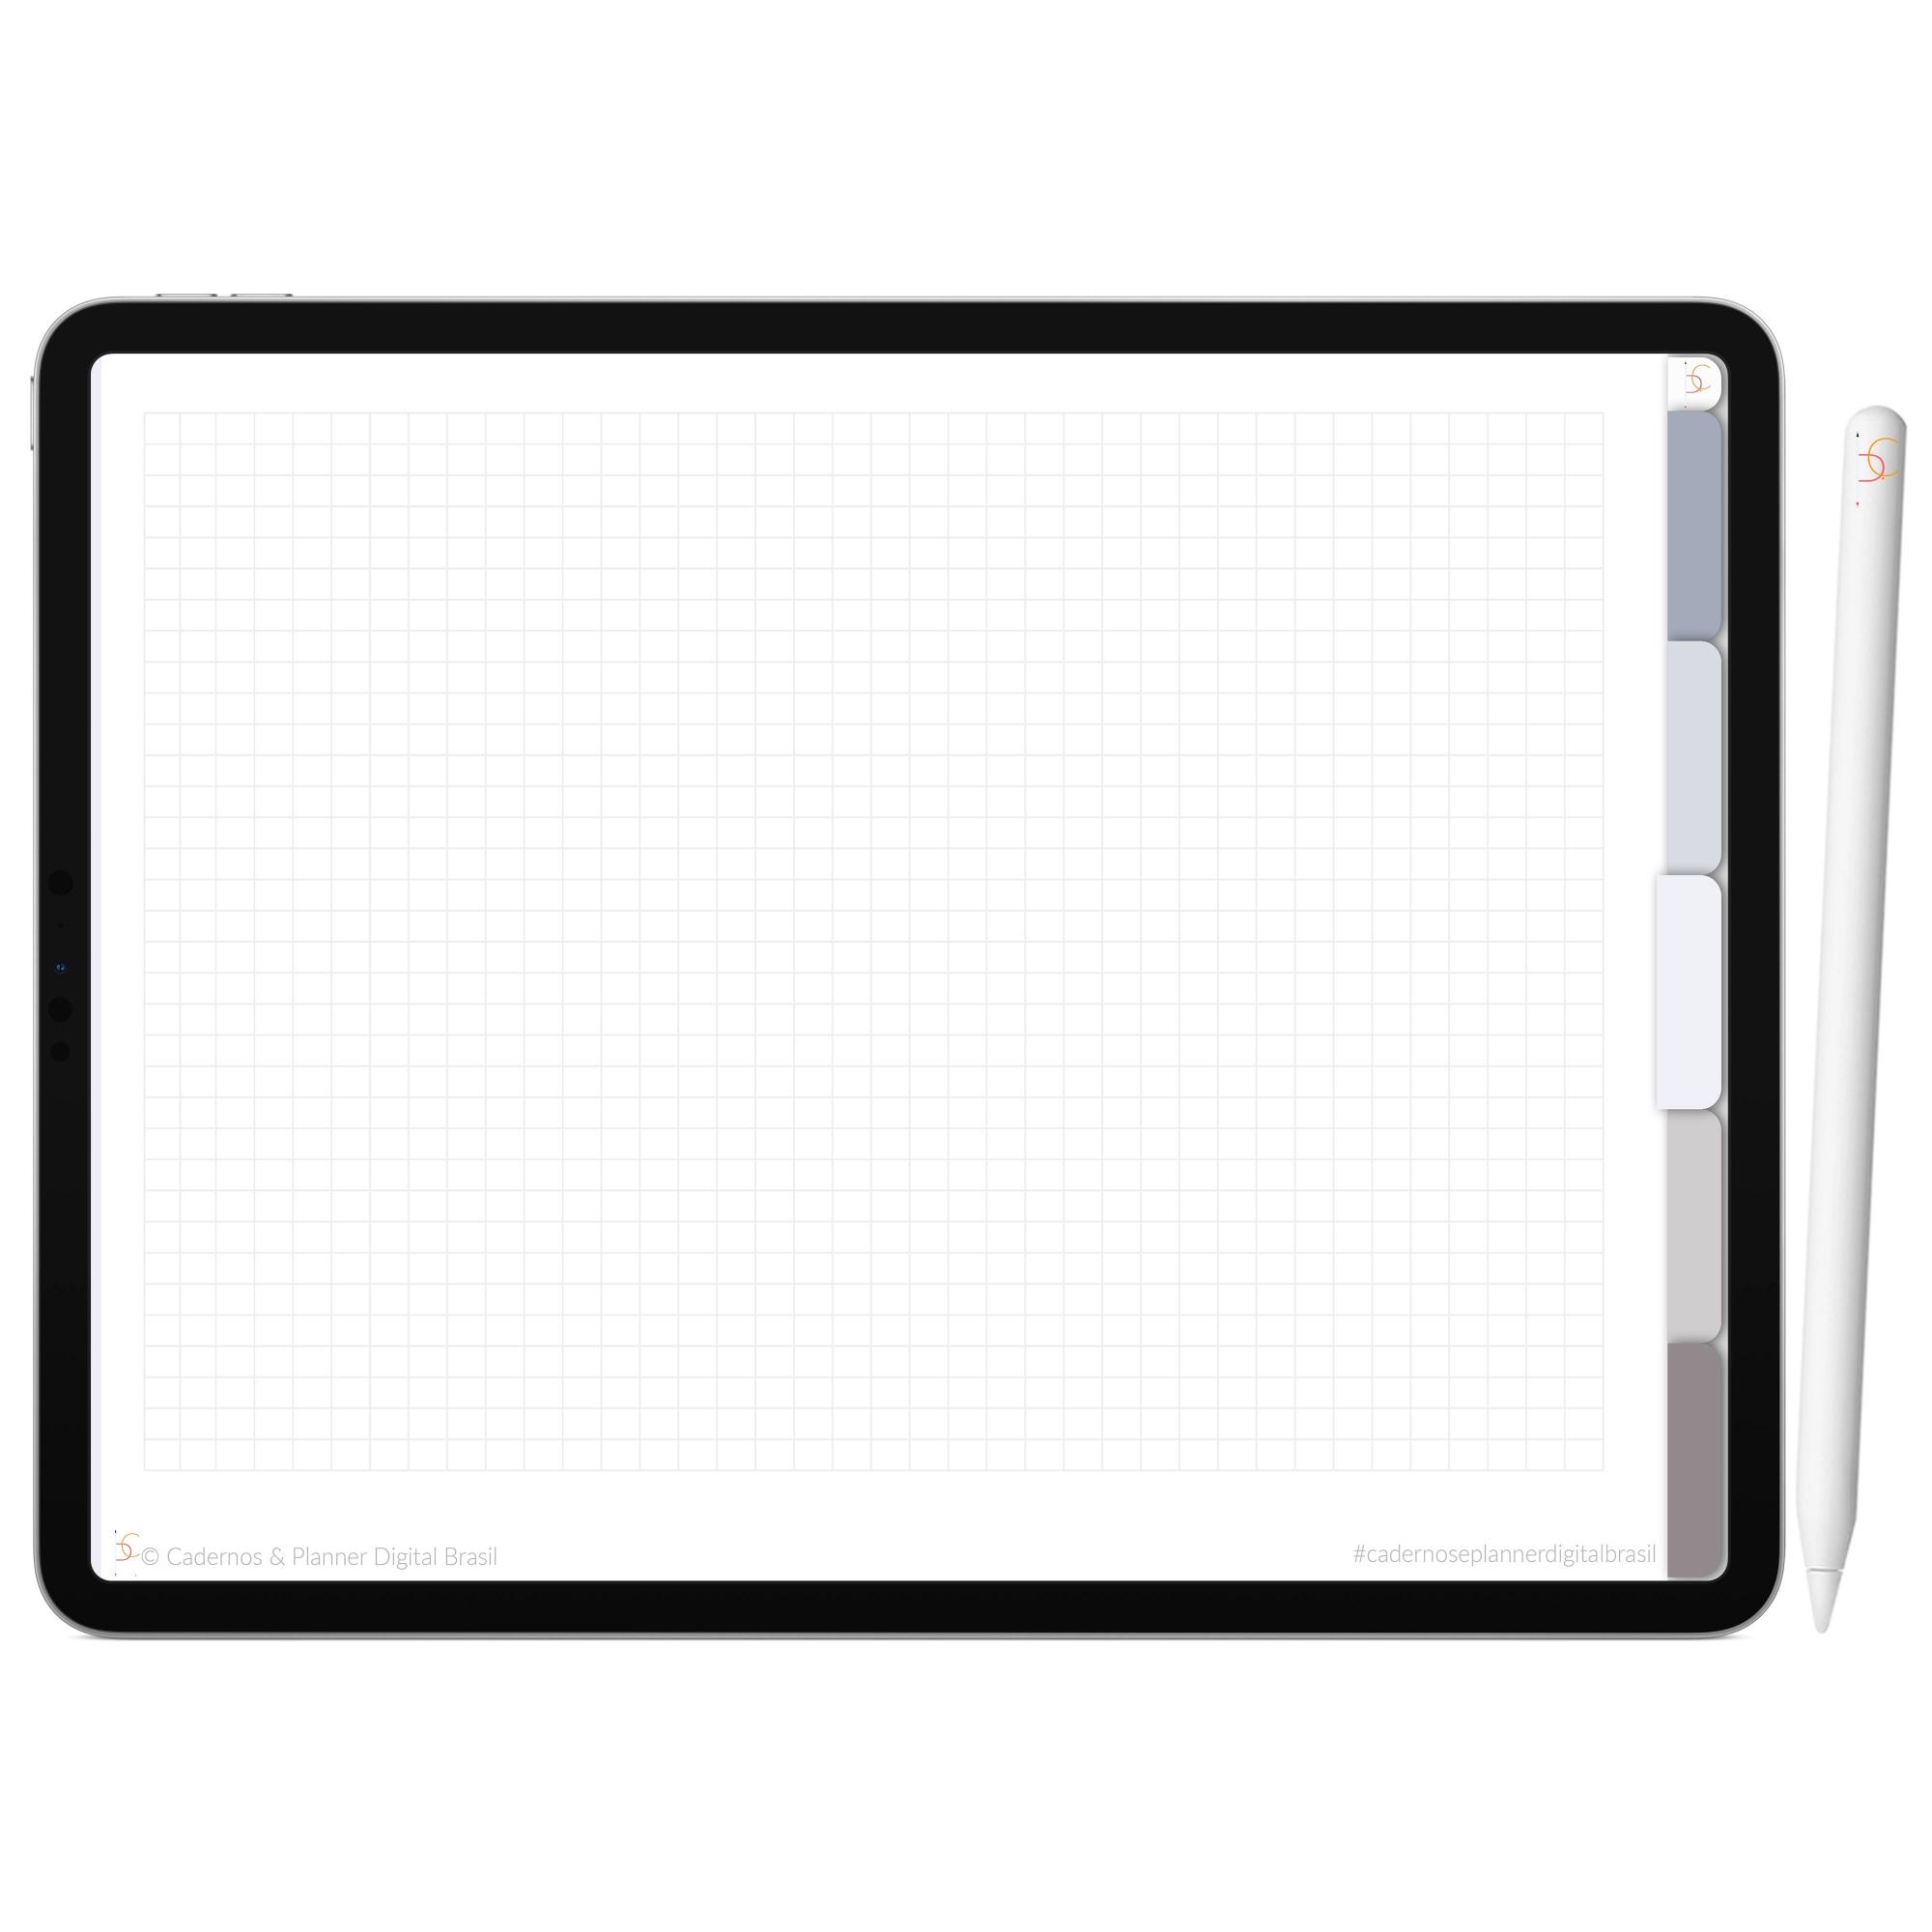 Mapa Mental Digital CinzAzul Céu Noturno | Cinco Matérias Interativo| iPad Tablet | Download Instantâneo